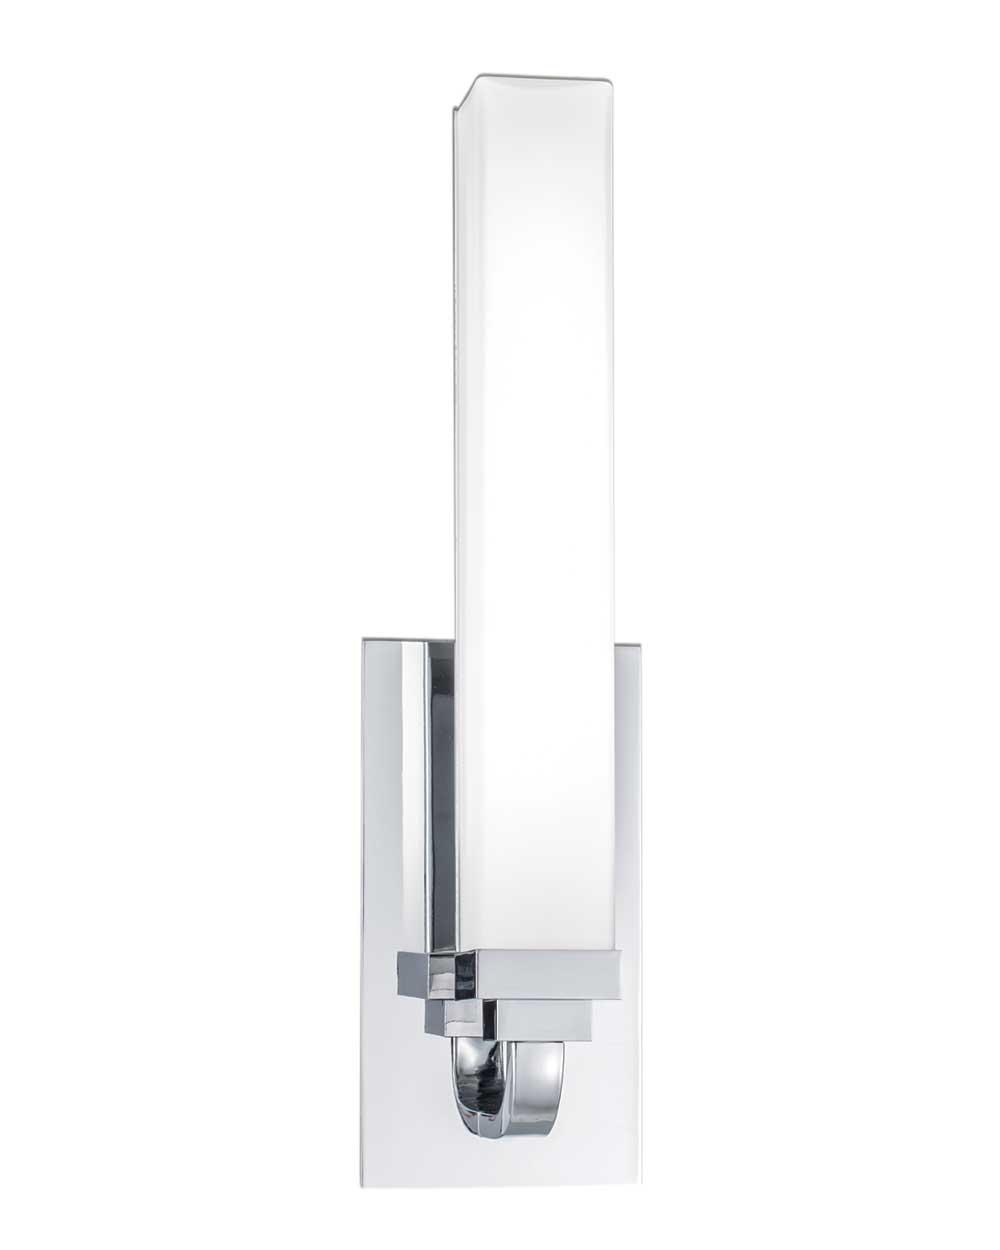 Norwell Lighting Tetris Single & Double LED Sconce